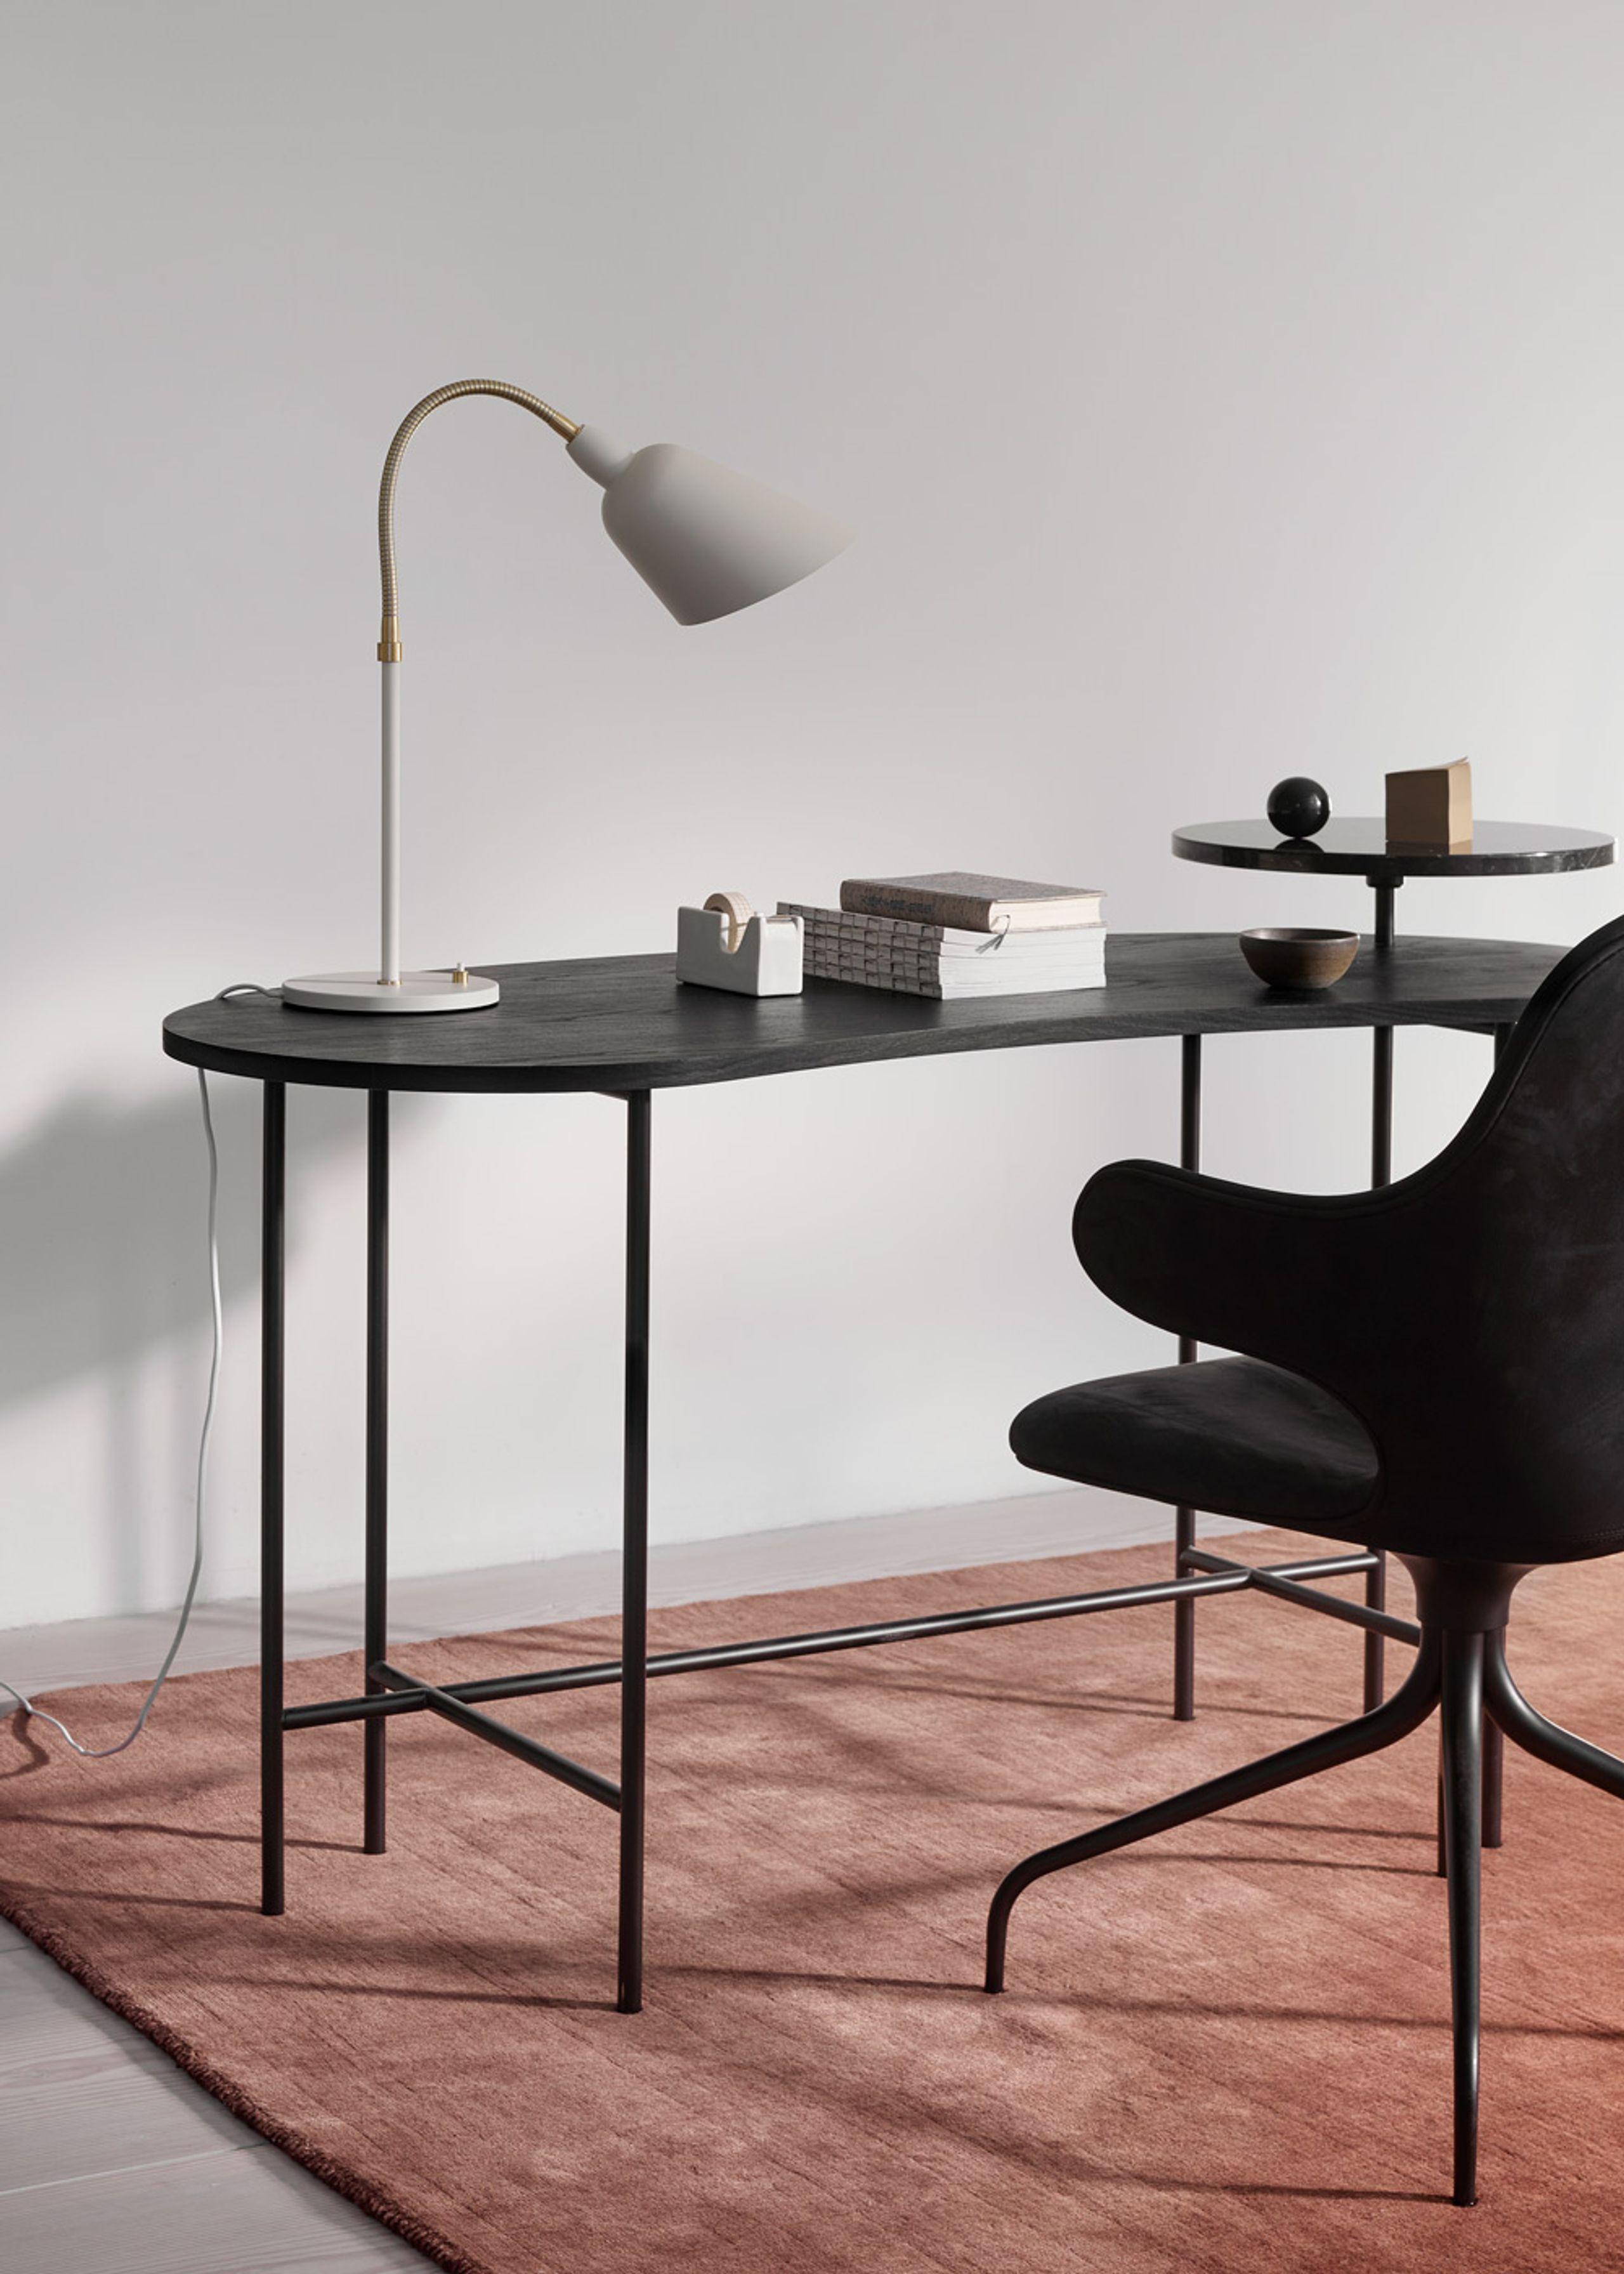 Bellevue / AJ8 by Arne Jacobsen - Table Lamp - &tradition